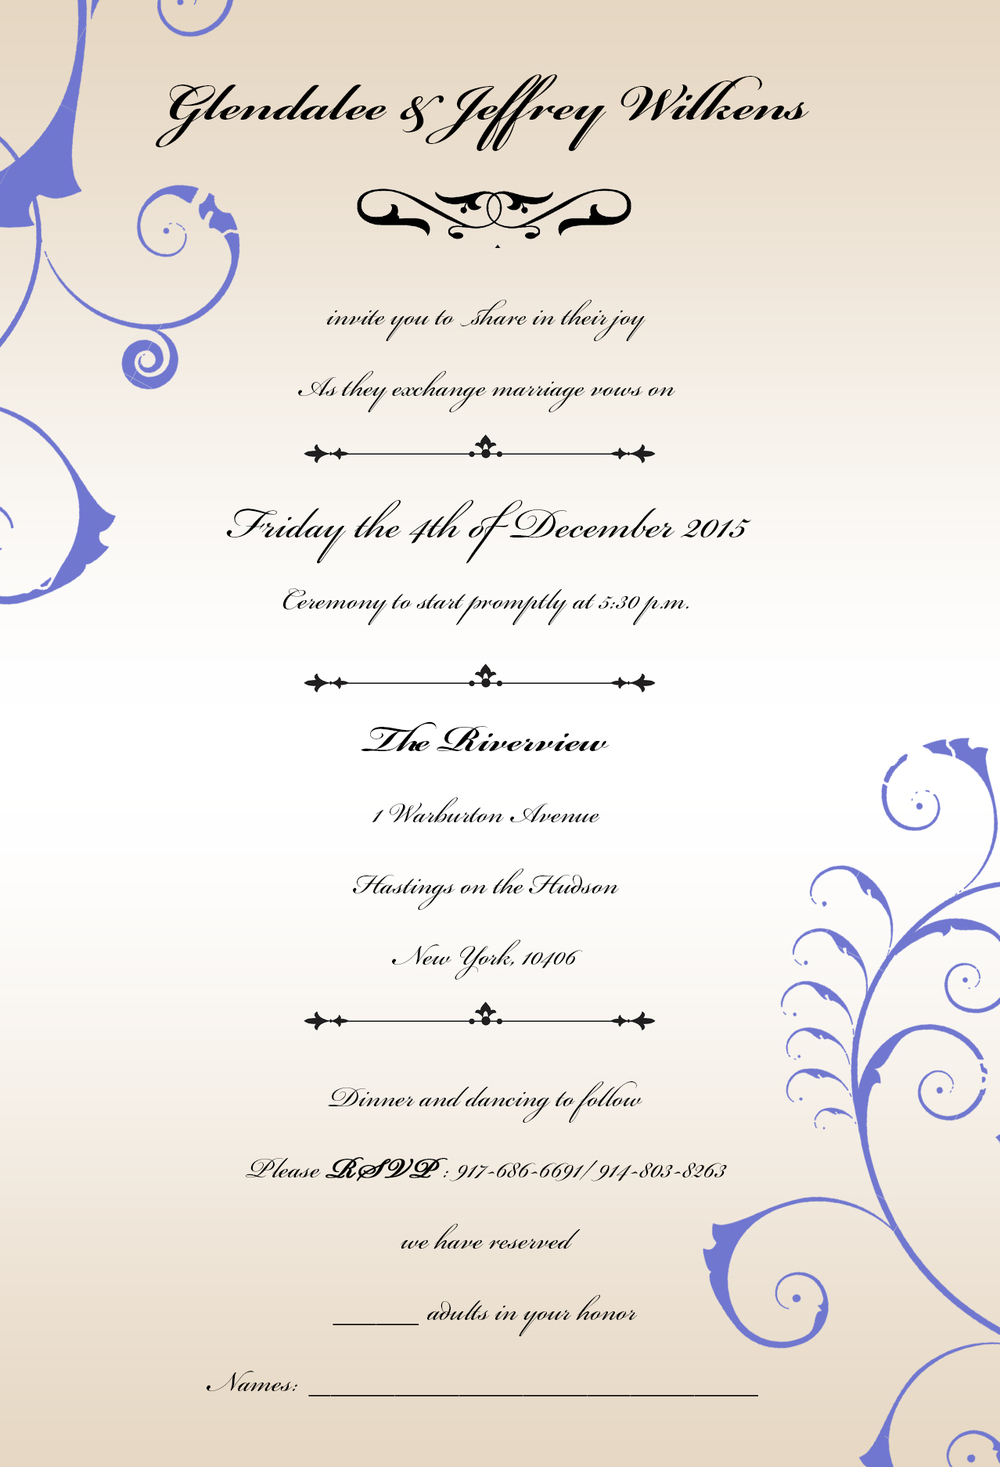 4x6 GLEN JEFF WEDDING INVITE BACK DEC 4 2015.jpg